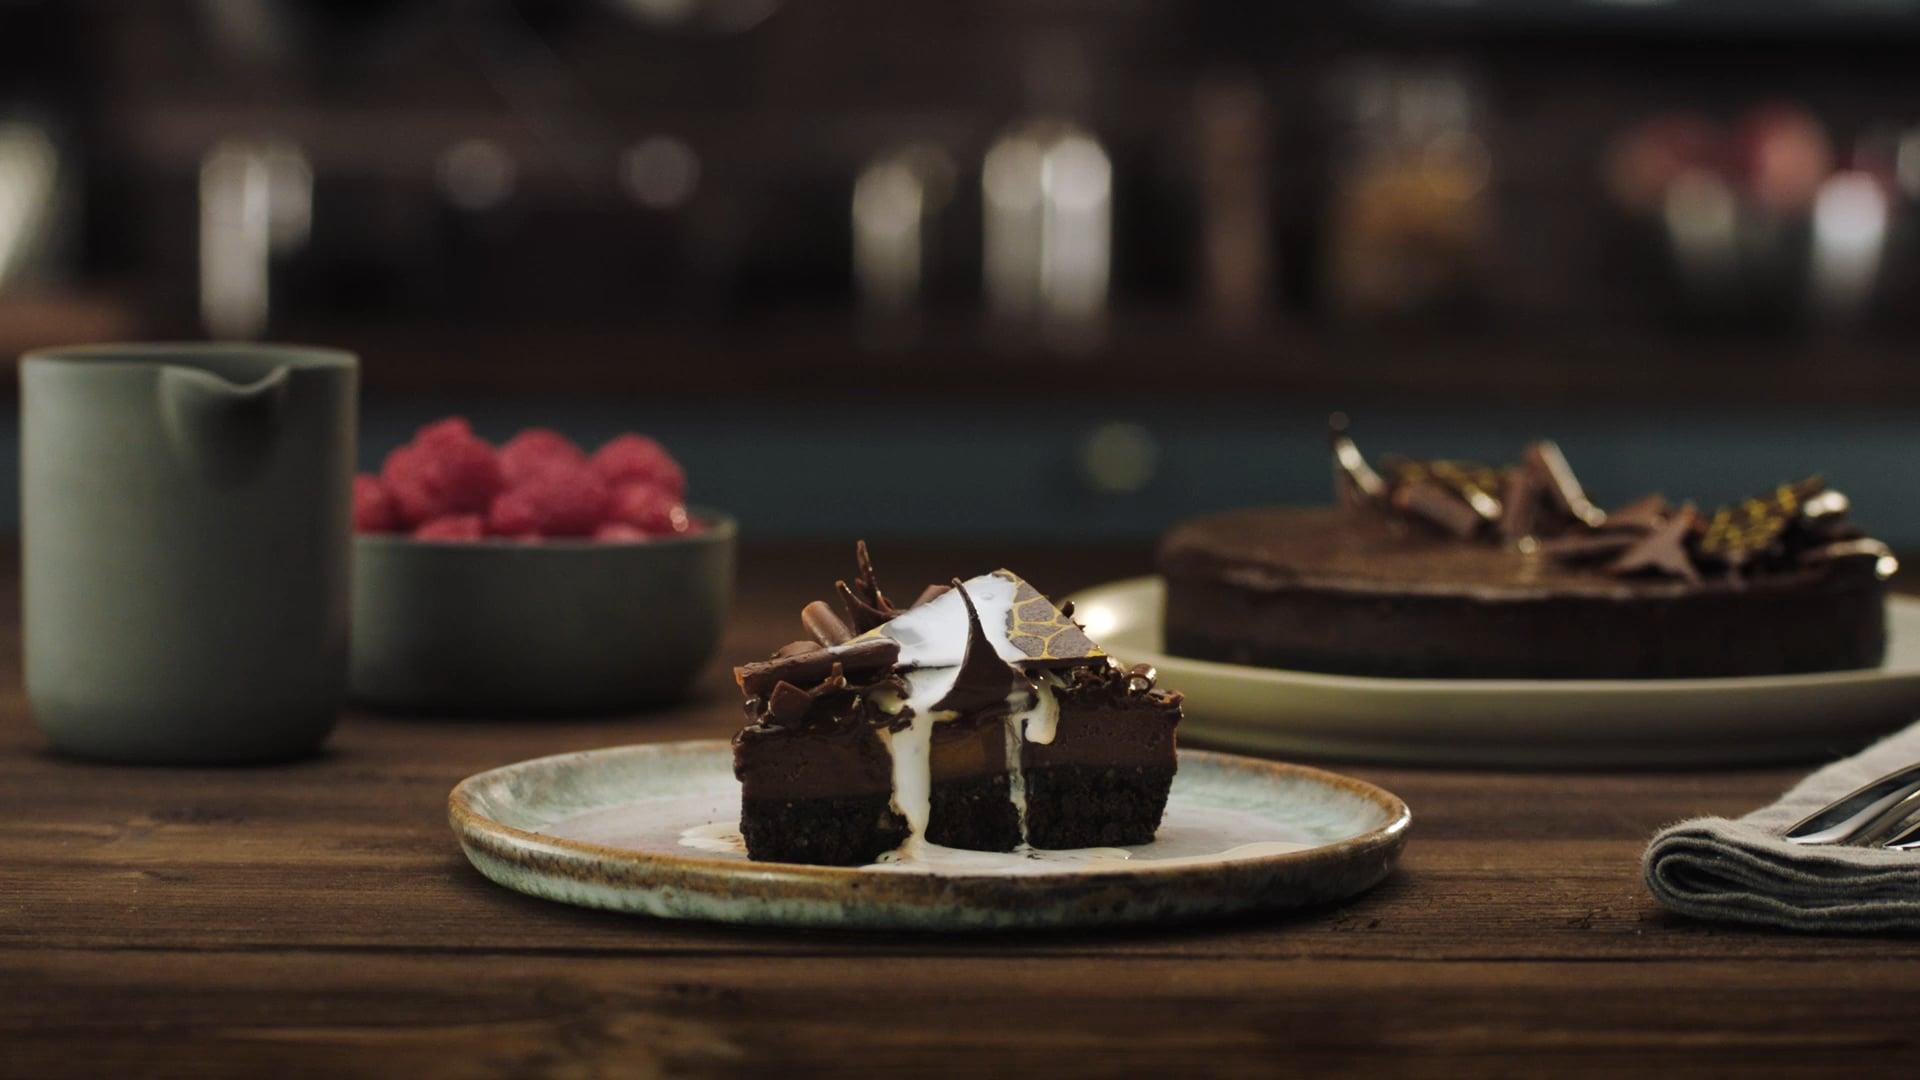 Tesco Finest - Caramel Chocolate Cheesecake